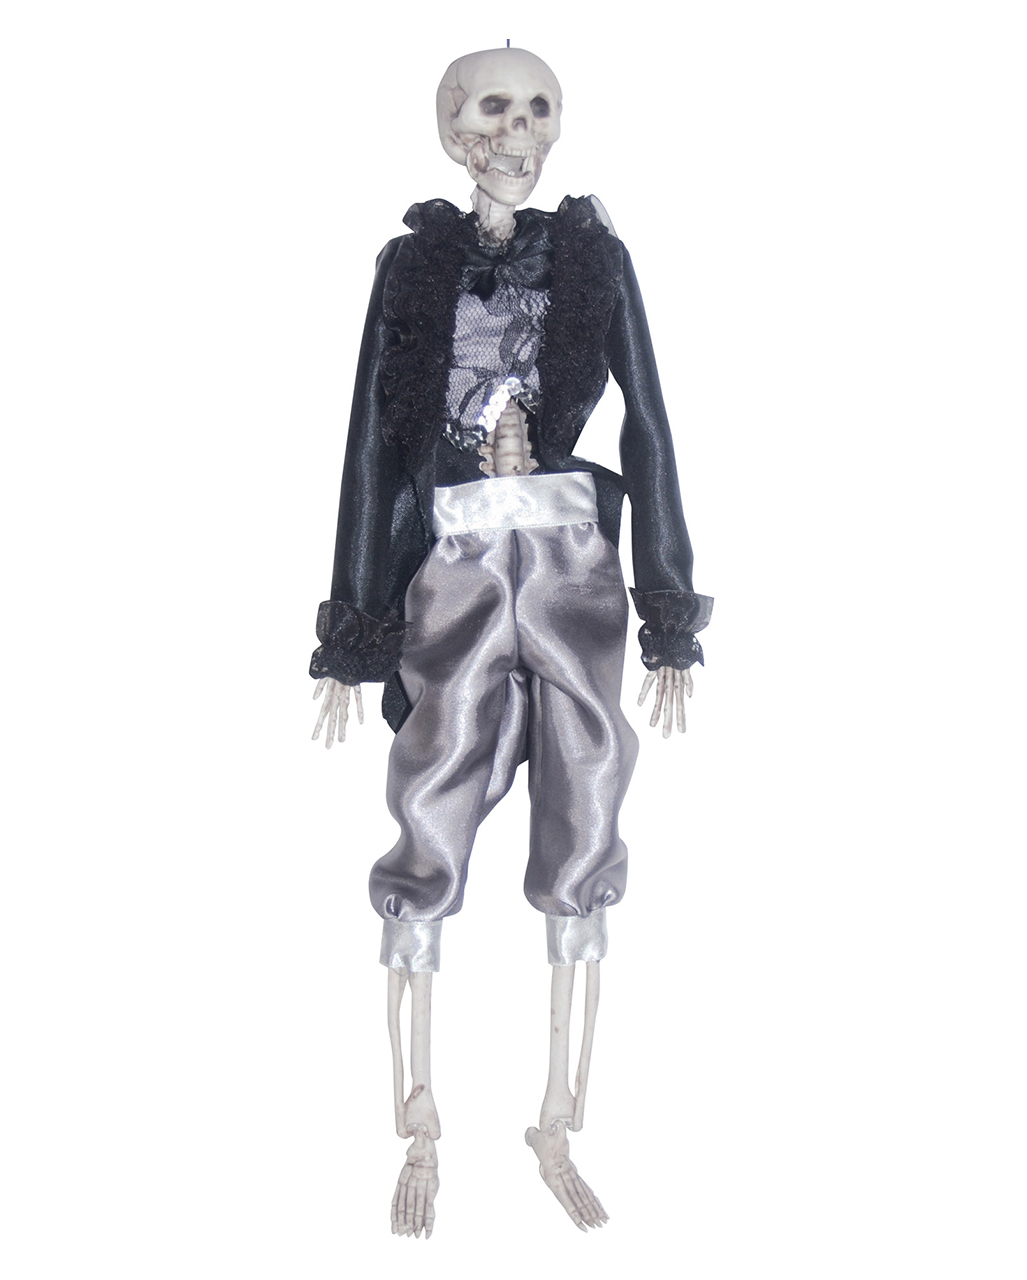 Halloween Kostüm Damen Skelett Schön Black Boney Groom Skelett Wedding Karneval Universe